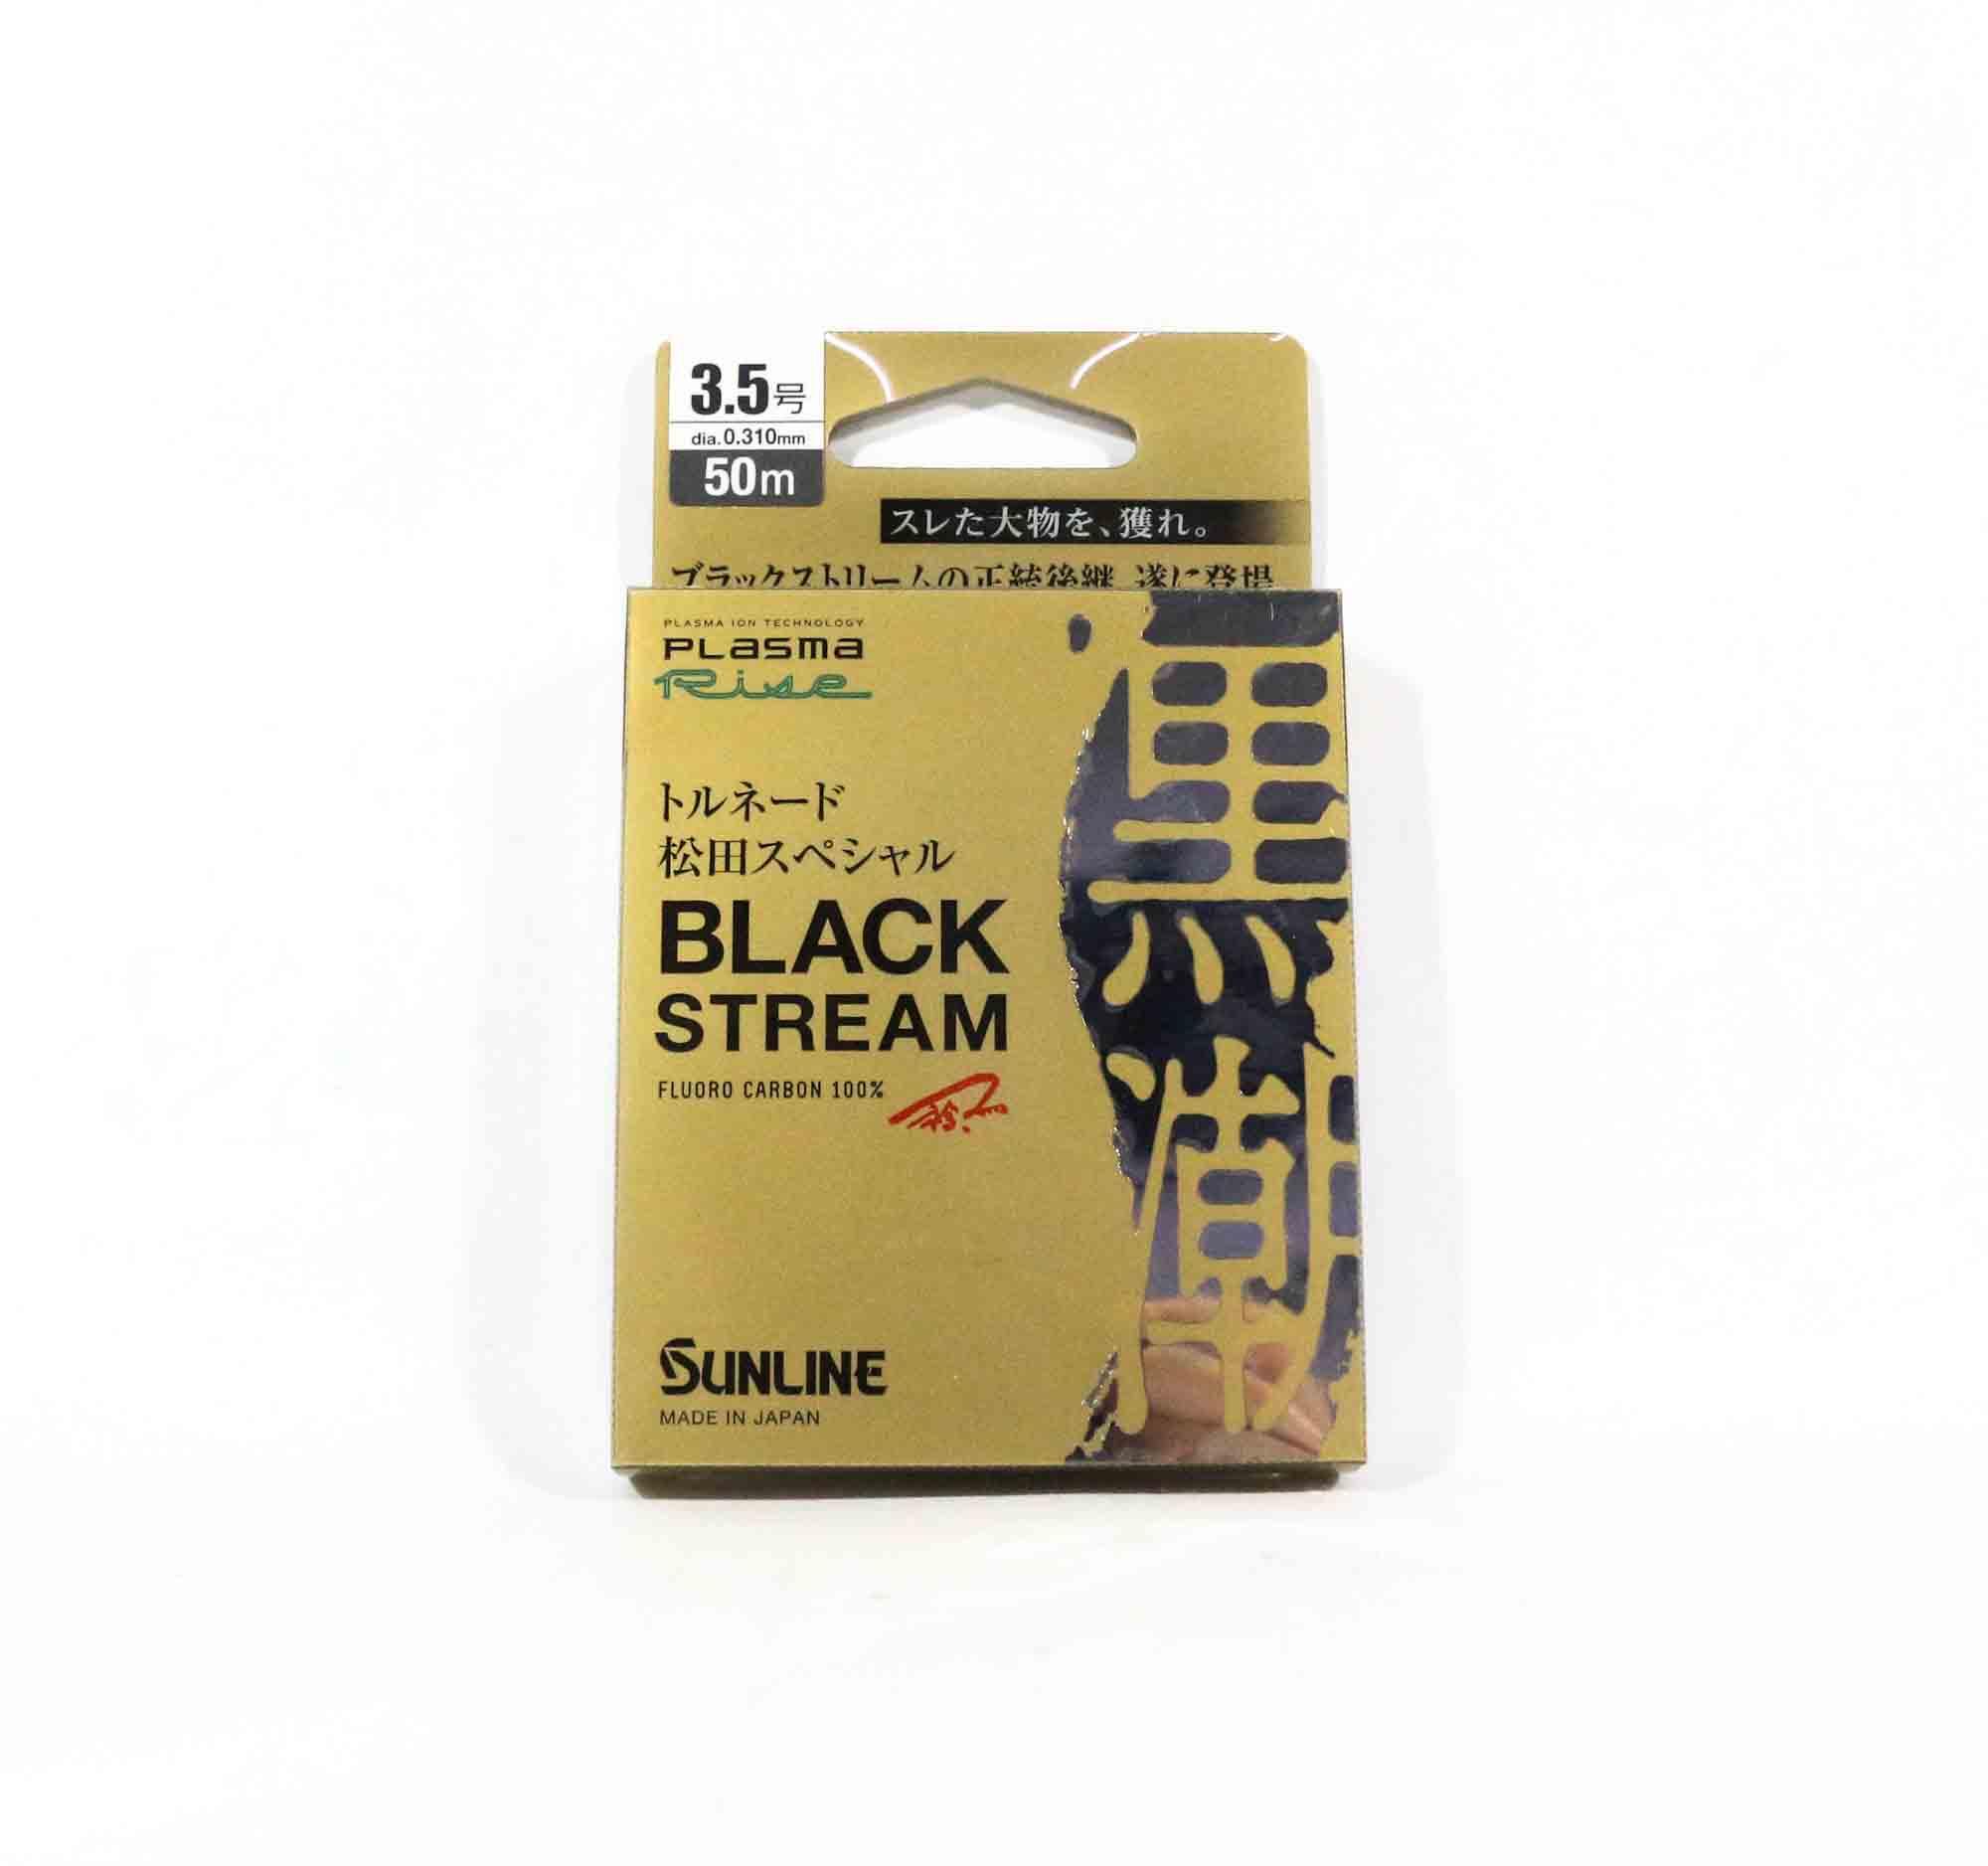 Sunline Fluorocarbon Leader Black Stream Plasma 50m Size 3.5 0.31mm 14lb (0761)